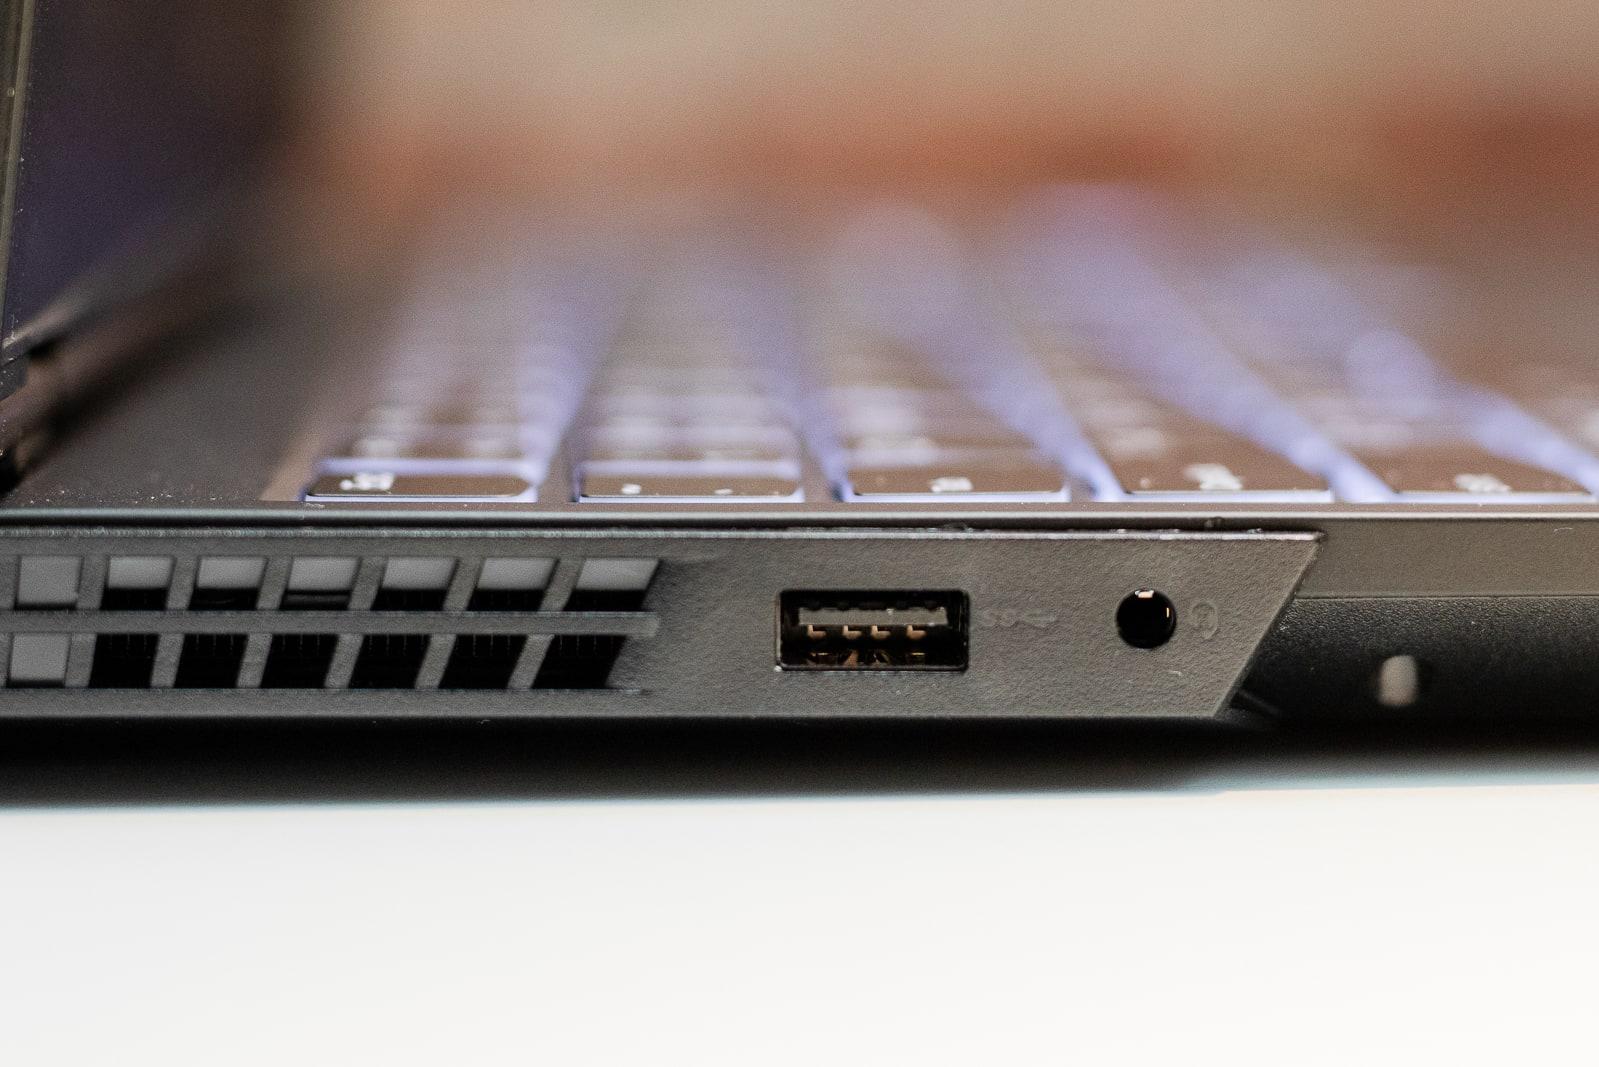 Cheap gaming laptops